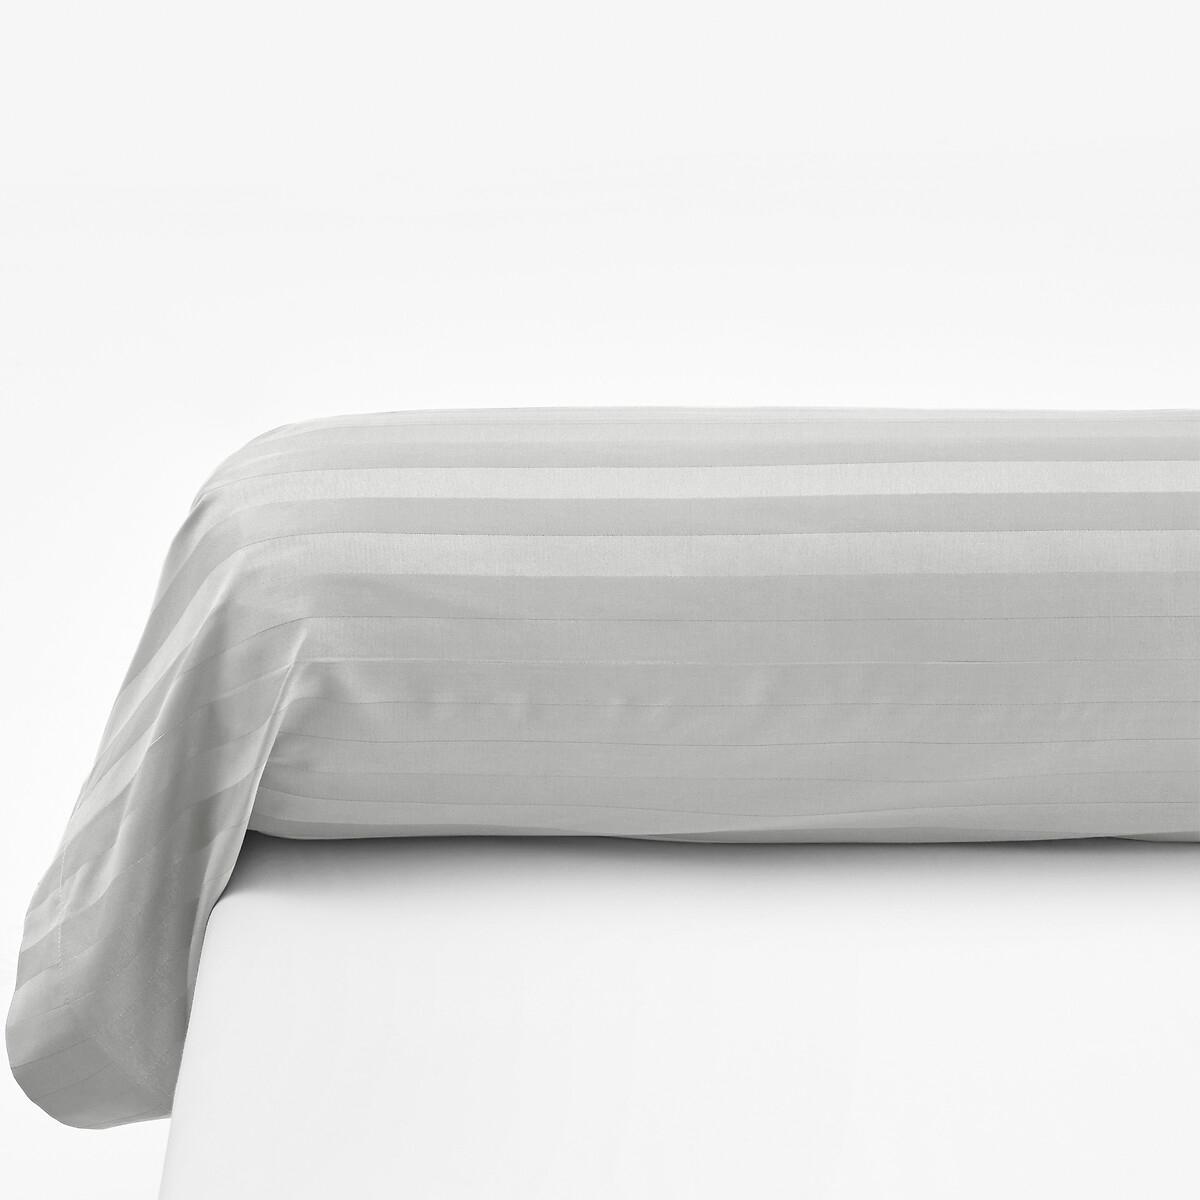 Чехол La Redoute На валик в полоску SATIN DE COTON 85 x 185 см серый чехол la redoute на подушку валик ecaille 45 x 45 см синий